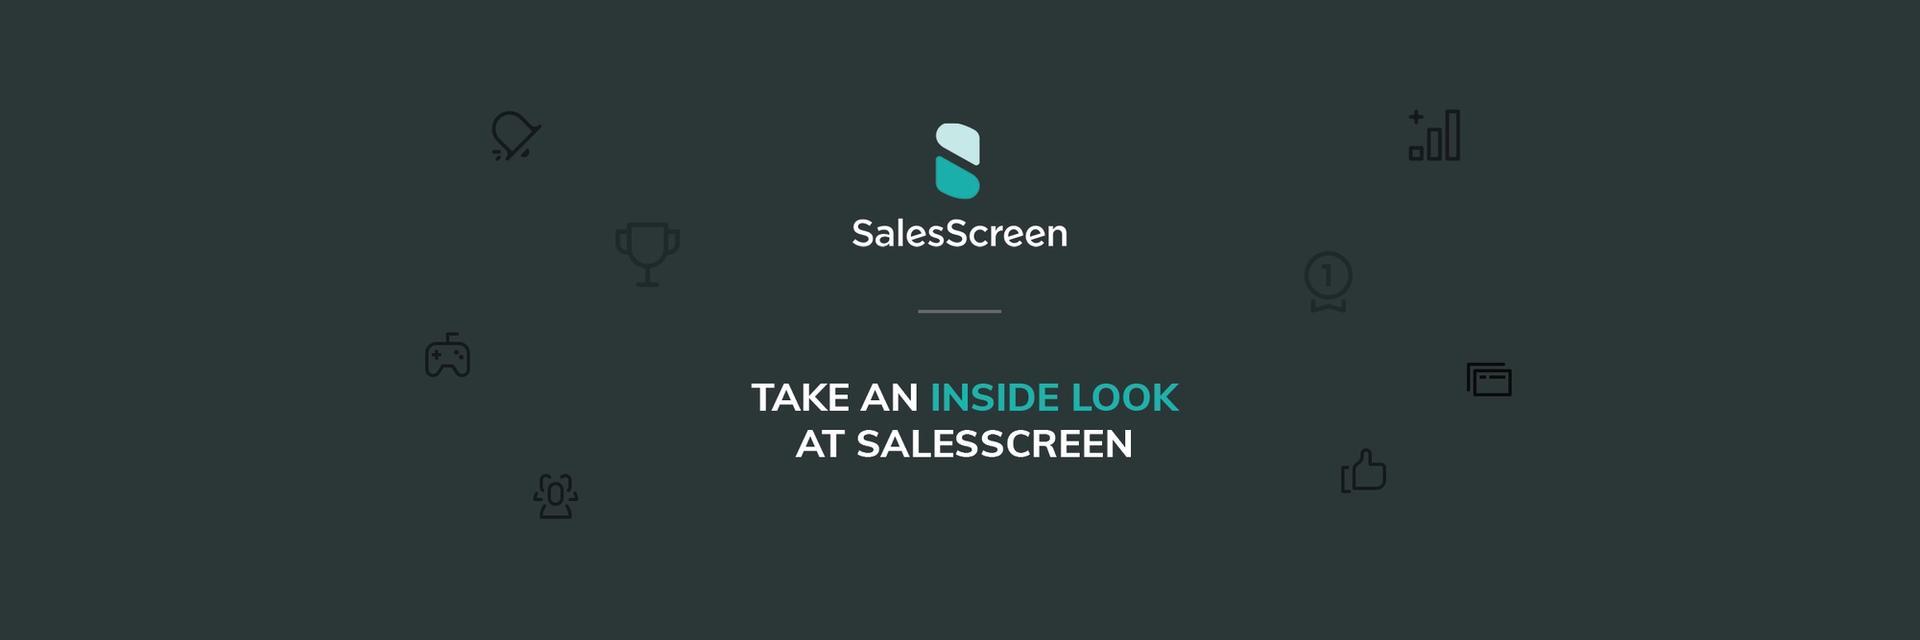 SalesScreen Inside Look